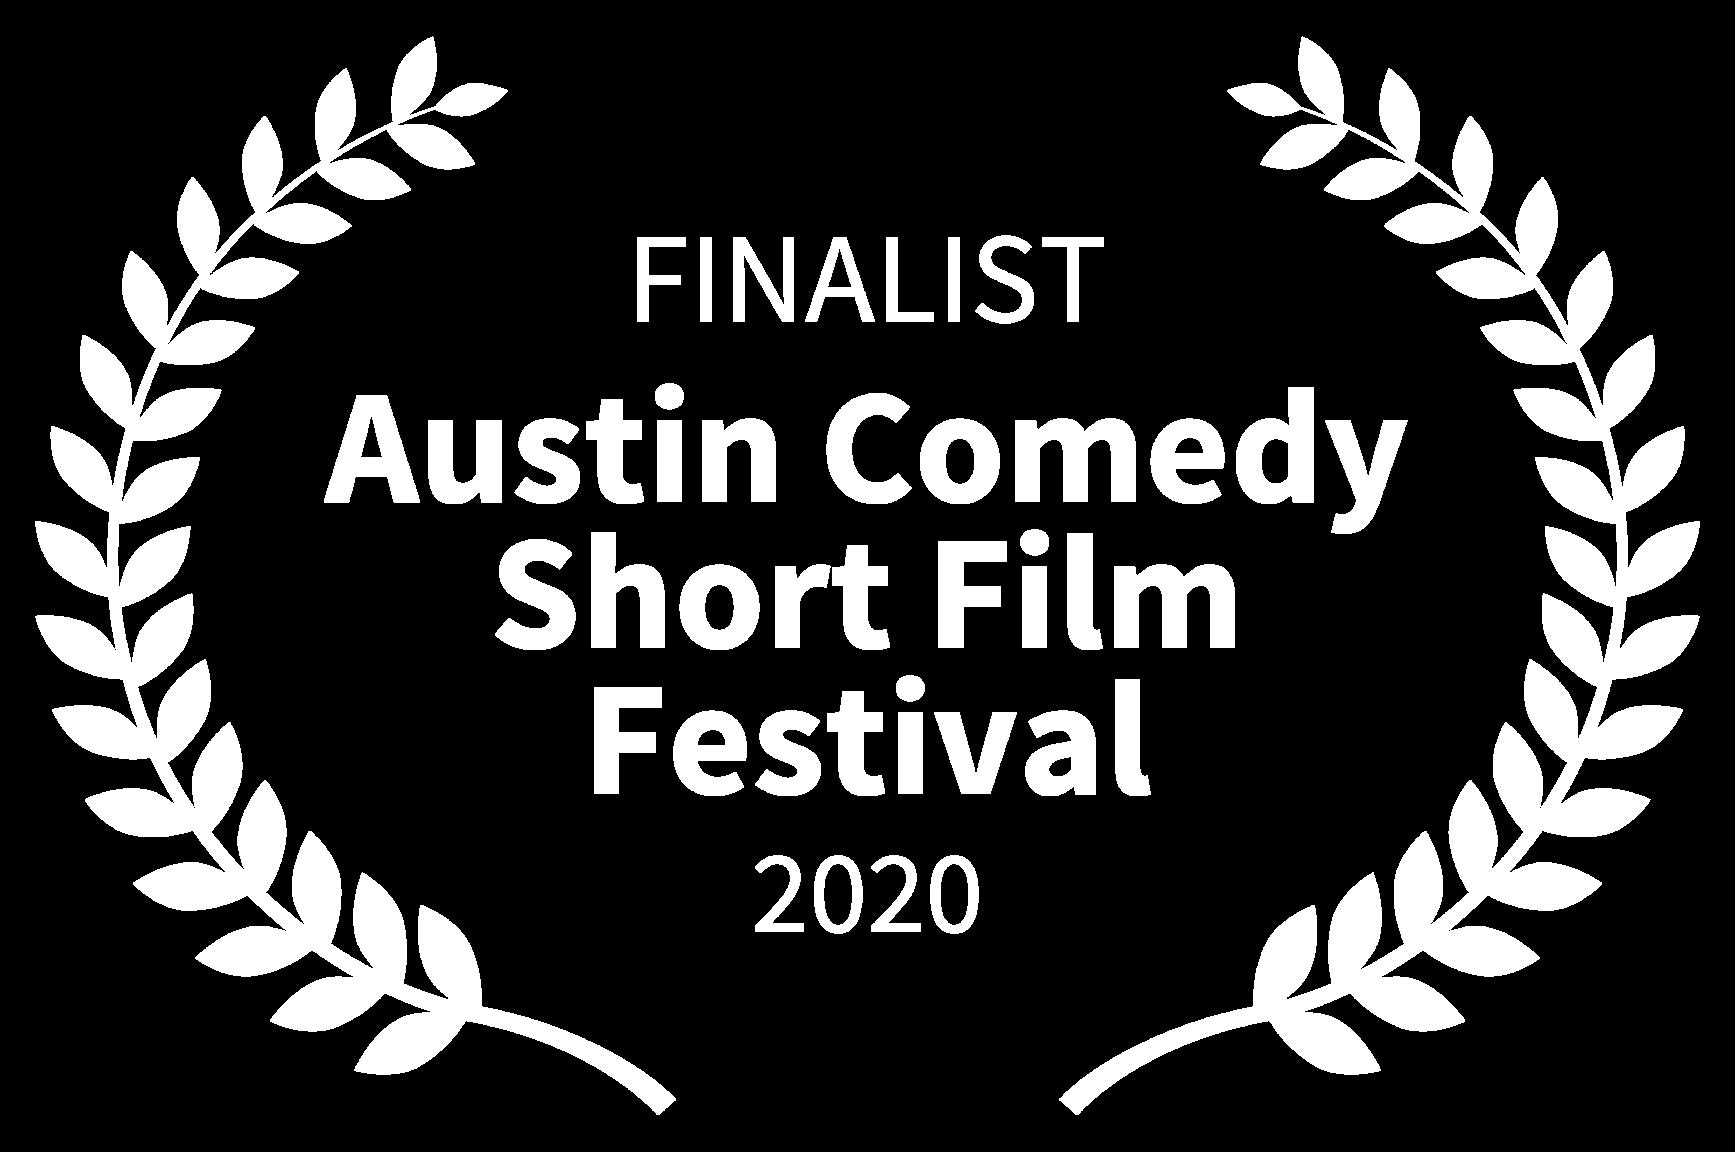 FINALIST - Austin Comedy Short Film Festival - 2020